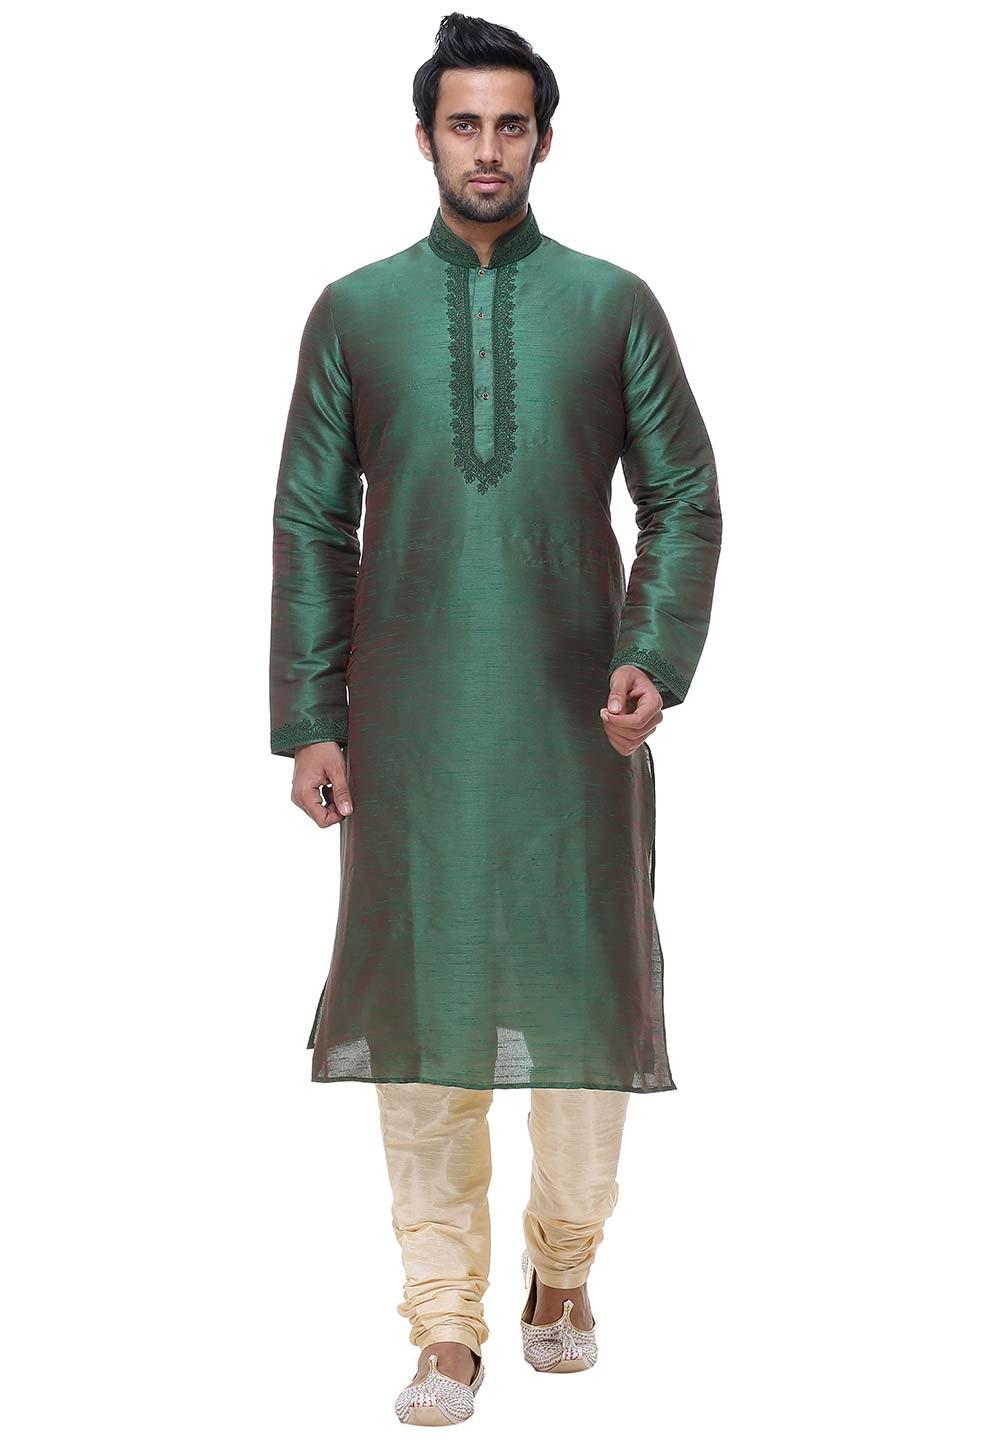 Exquisite Green Color Silk Readymade Kurta Pajama.